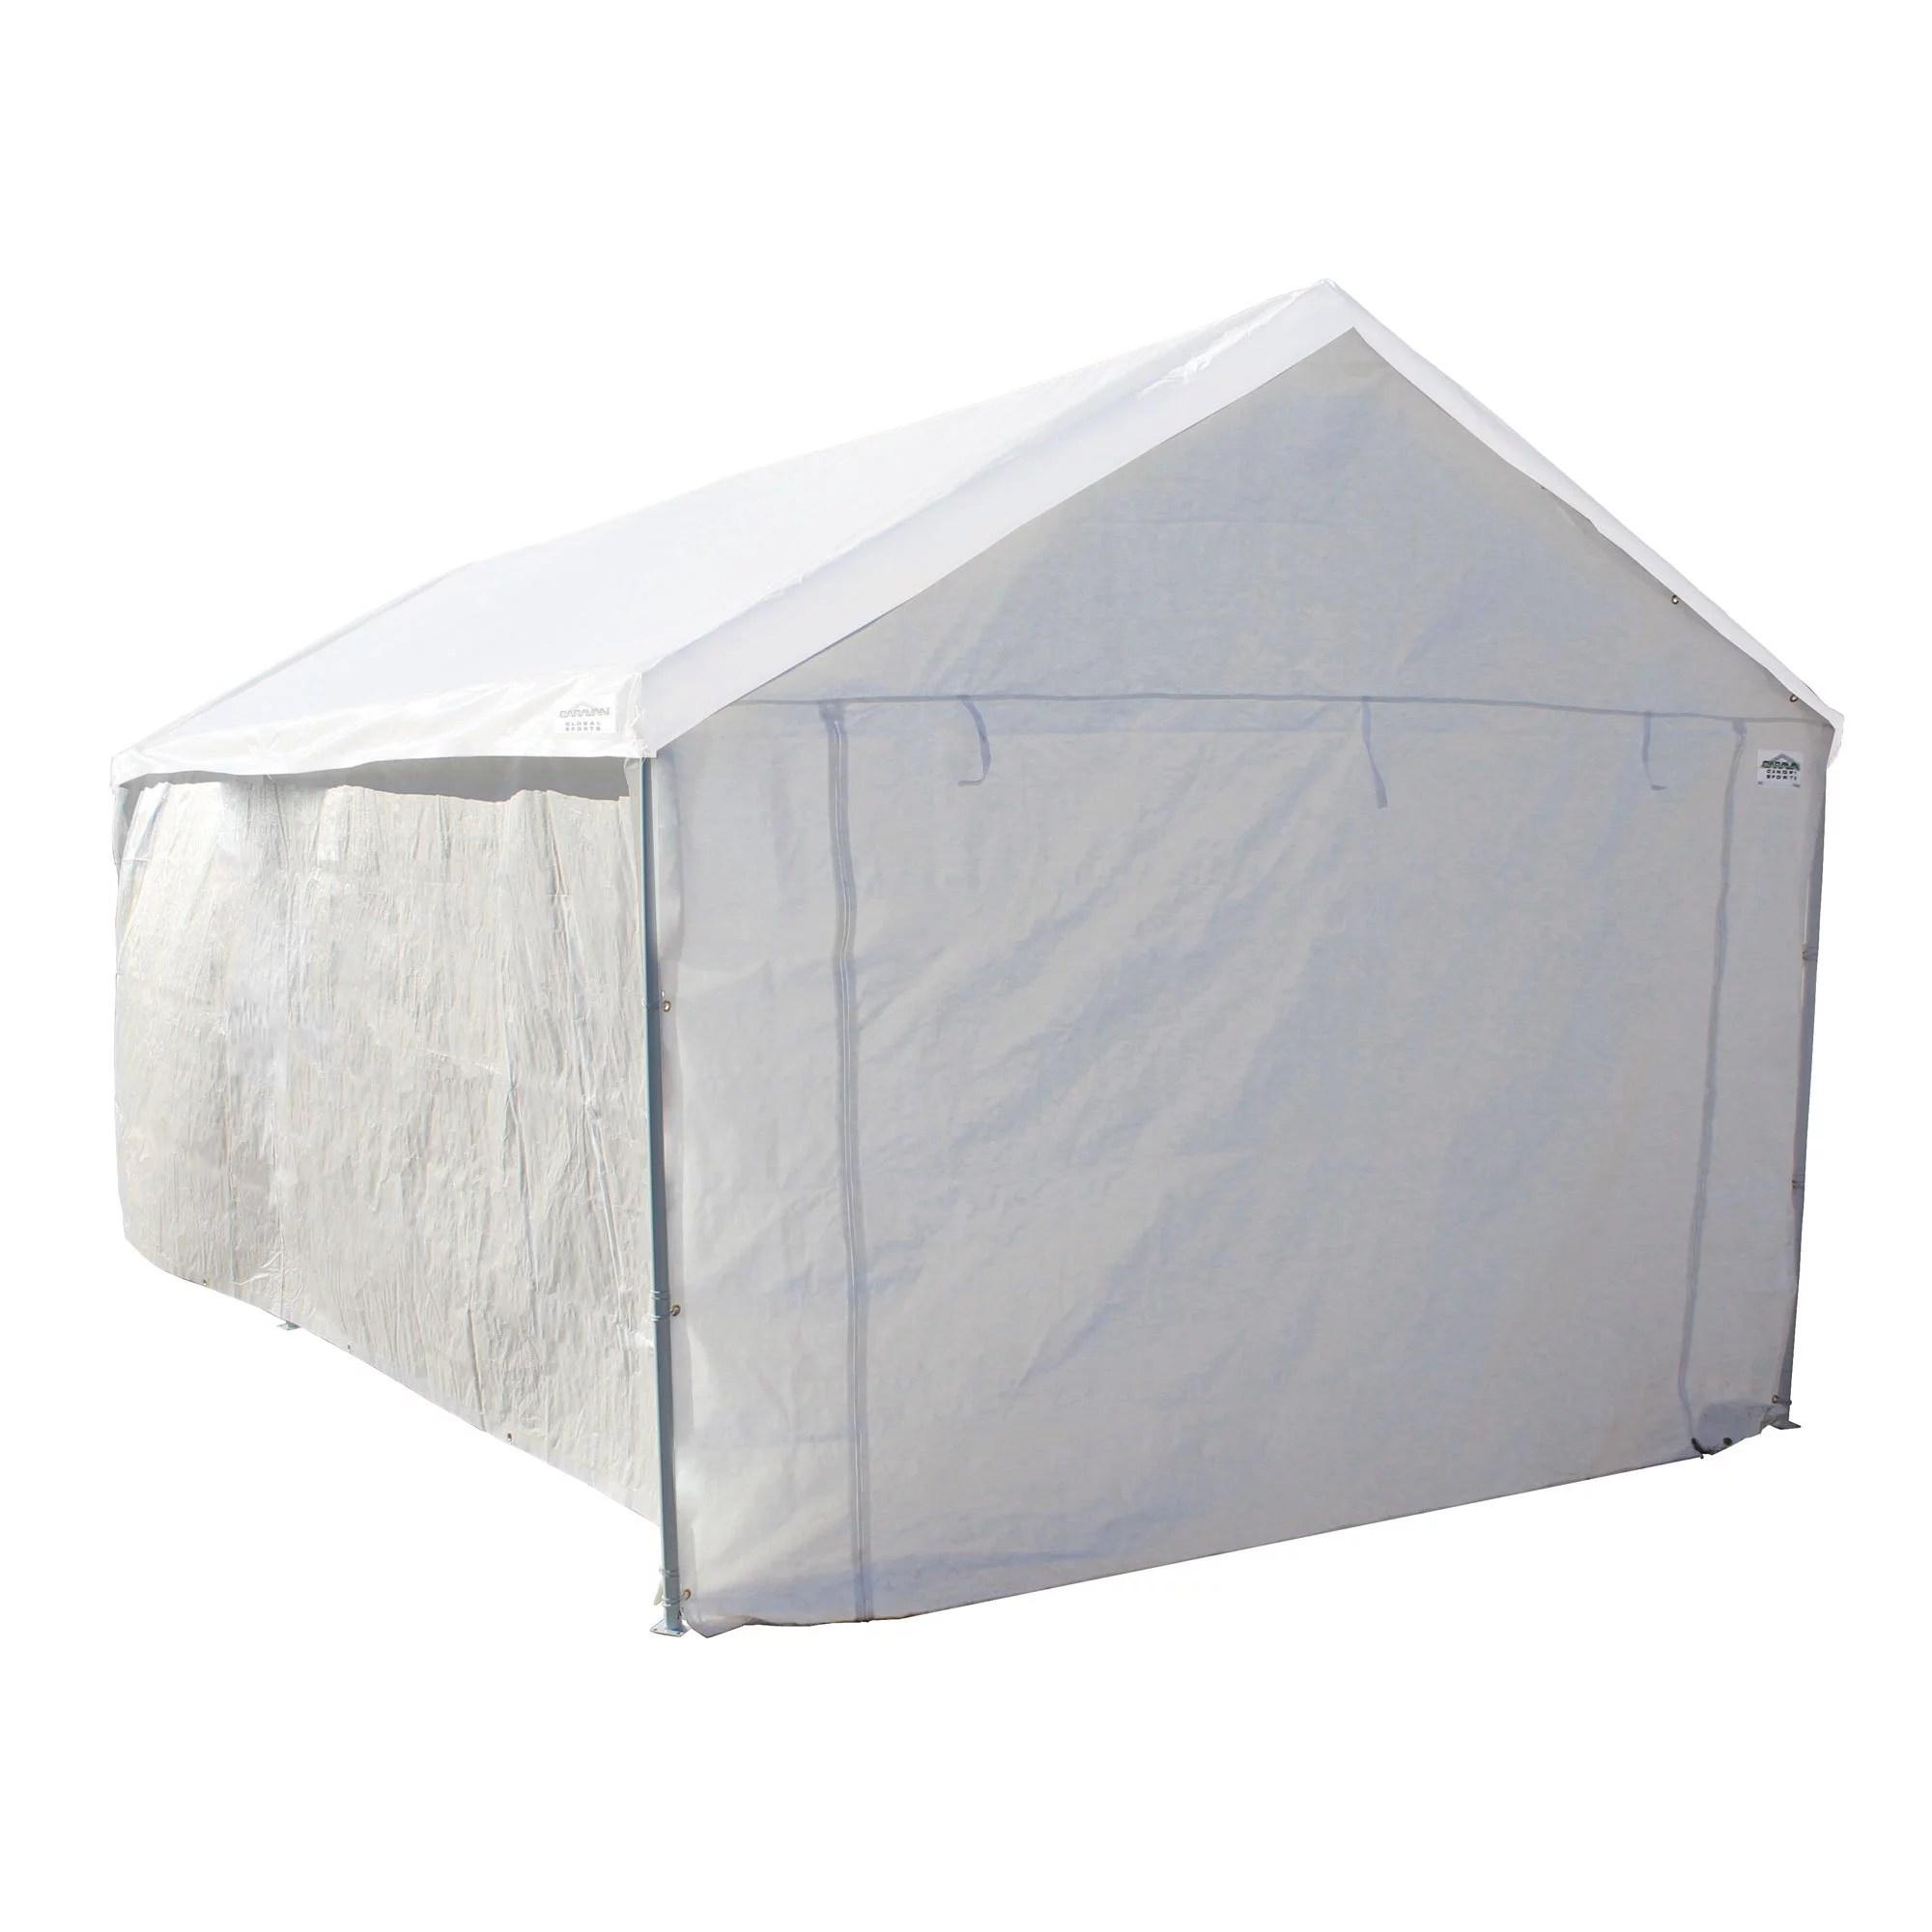 Caravan Canopy 10 X 20 Domain Carport Garage With SidewallEnclosure Value Bundle